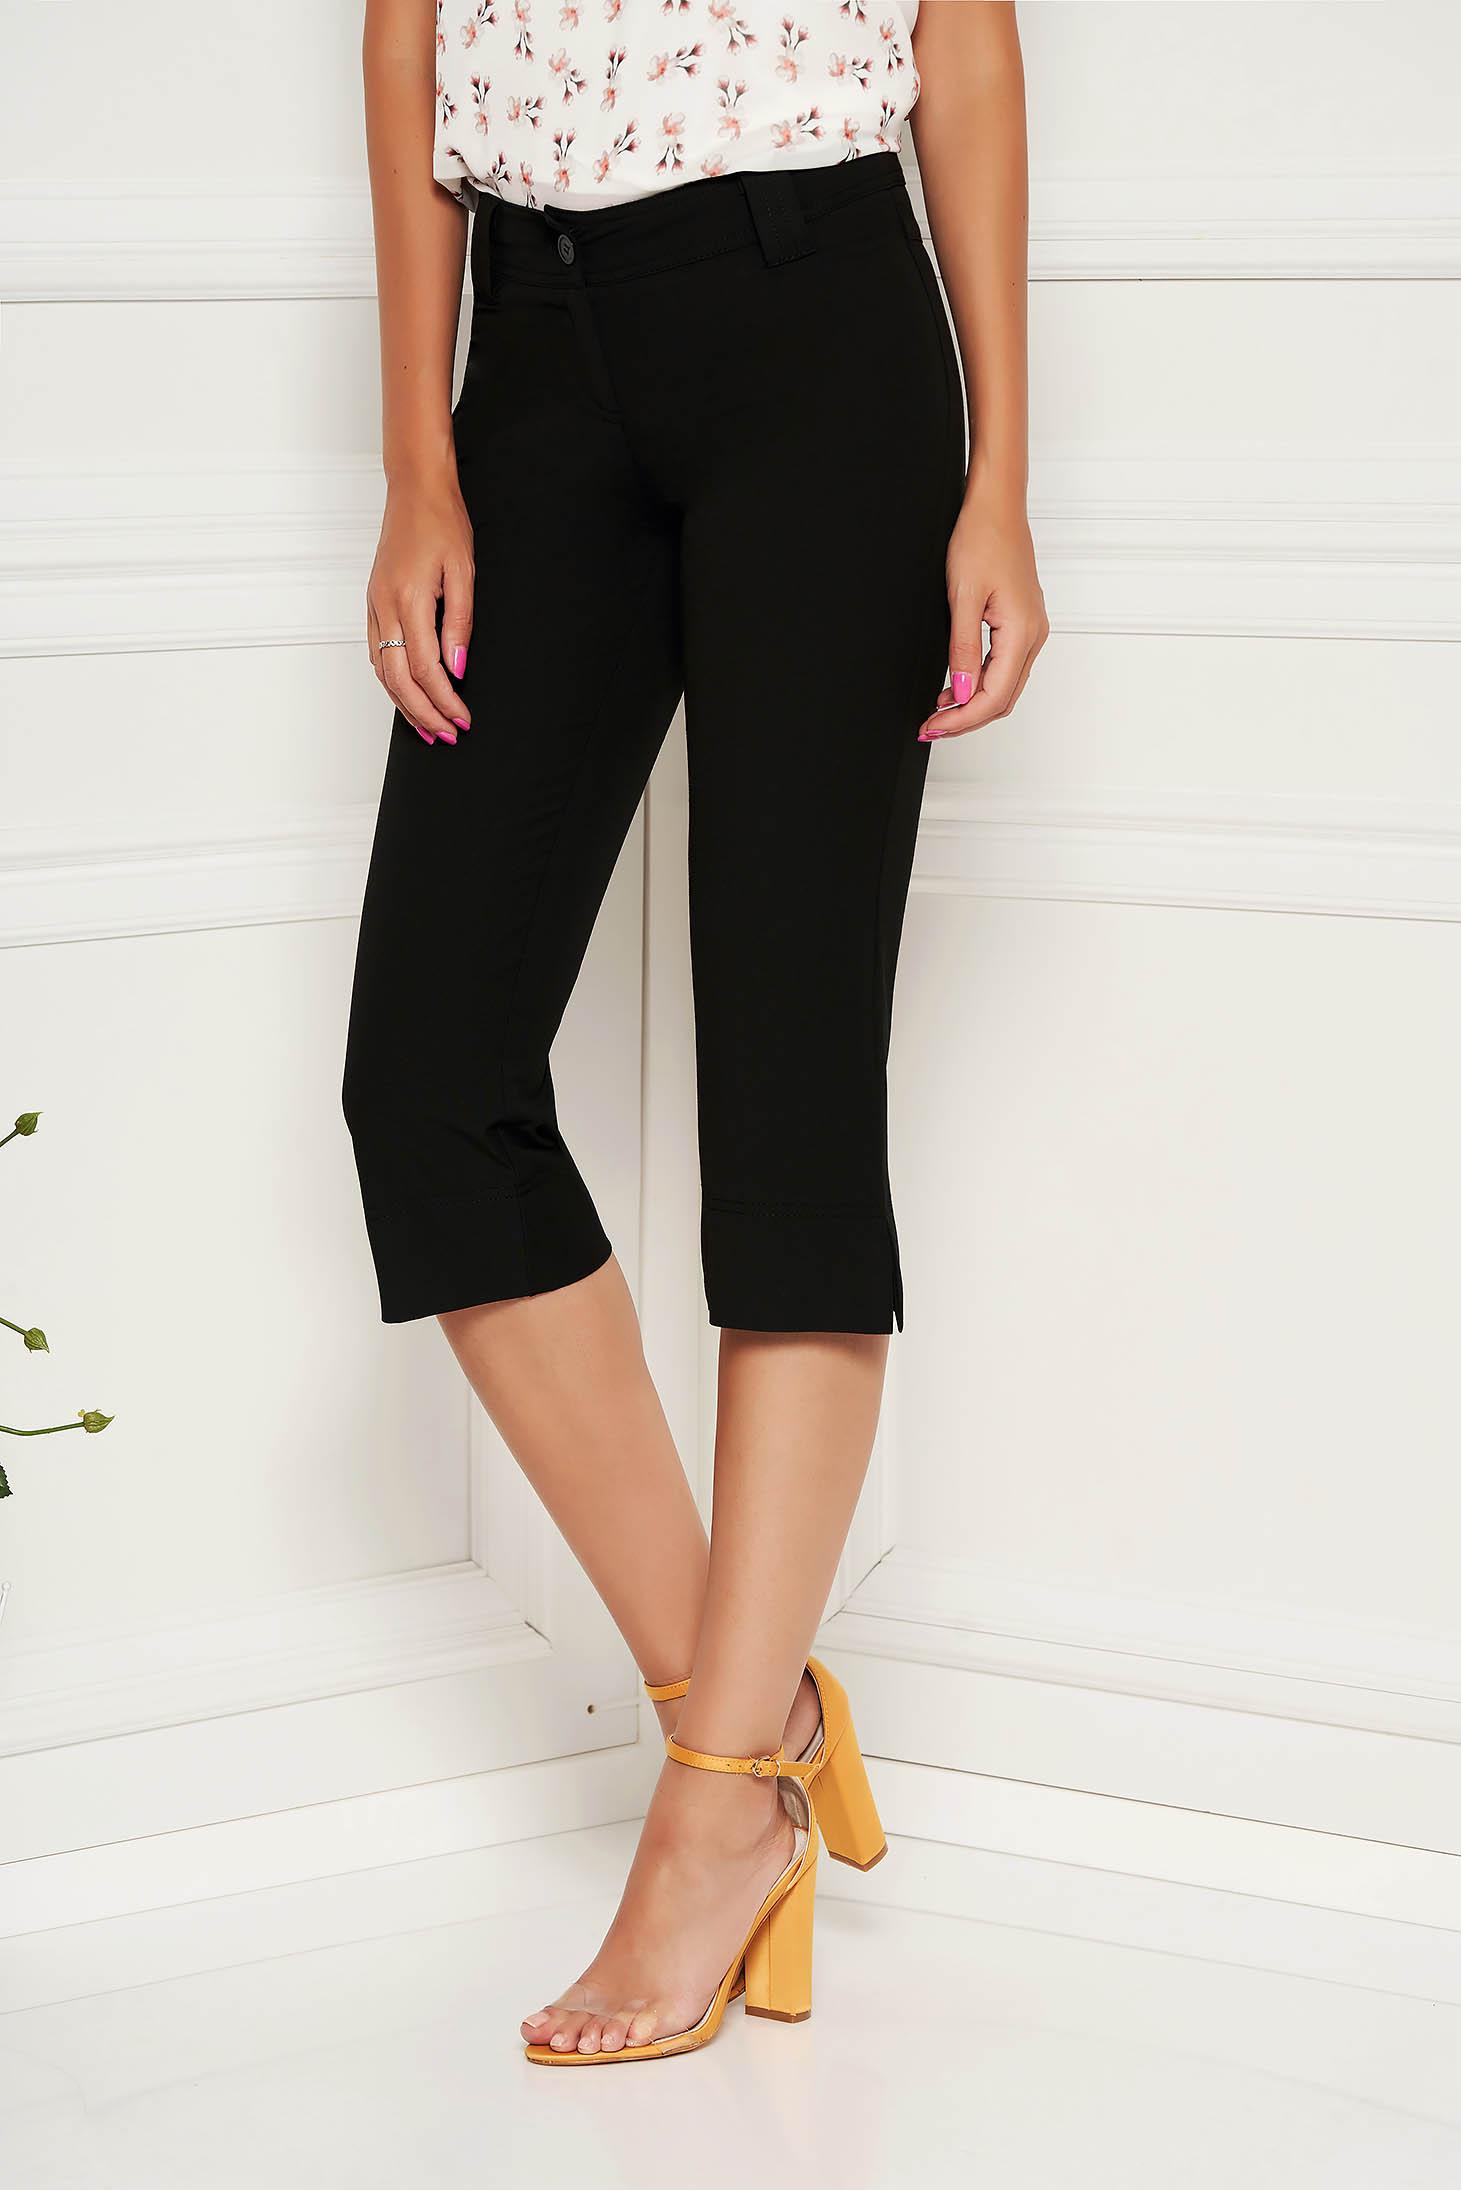 Fekete StarShinerS nadrág casual pamutból készült kónikus 3/4-es